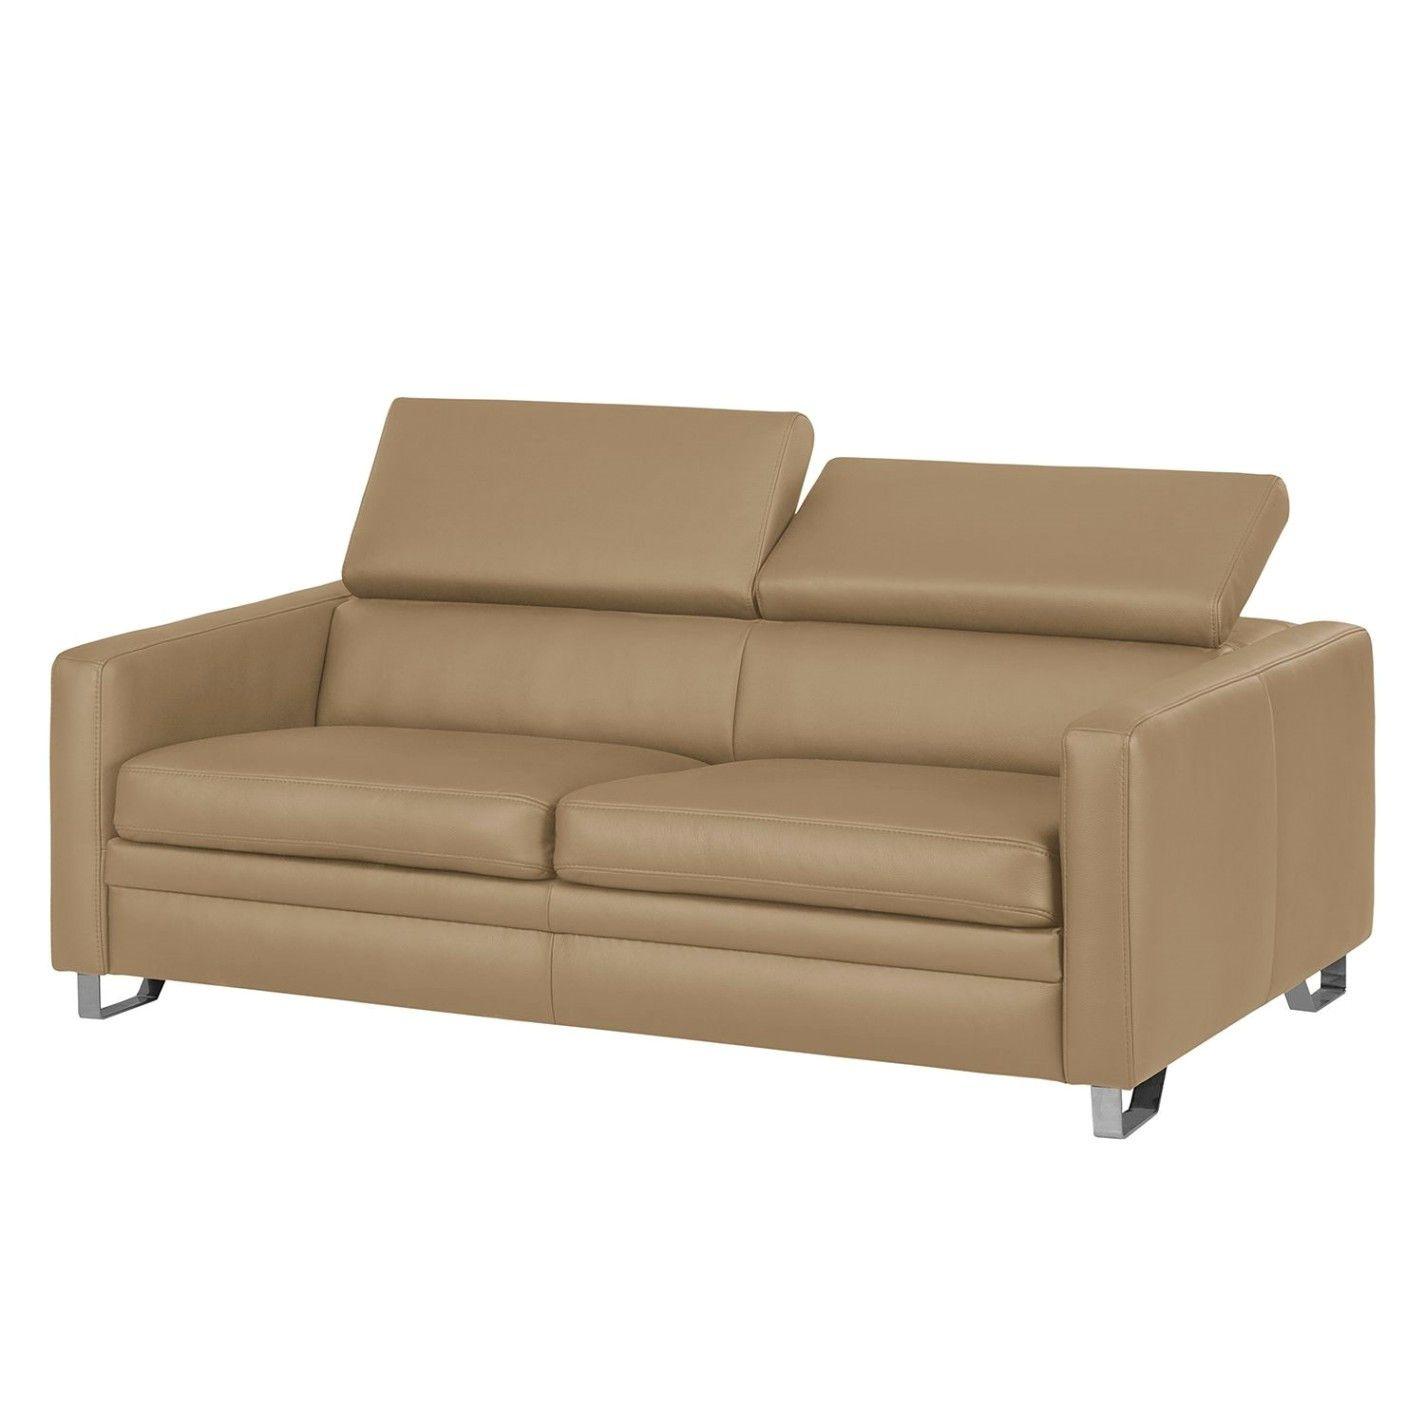 25 Luxus 2 Sitzer Ecke Chaiselongue Sofa Chaiselongue Sofa Sofa